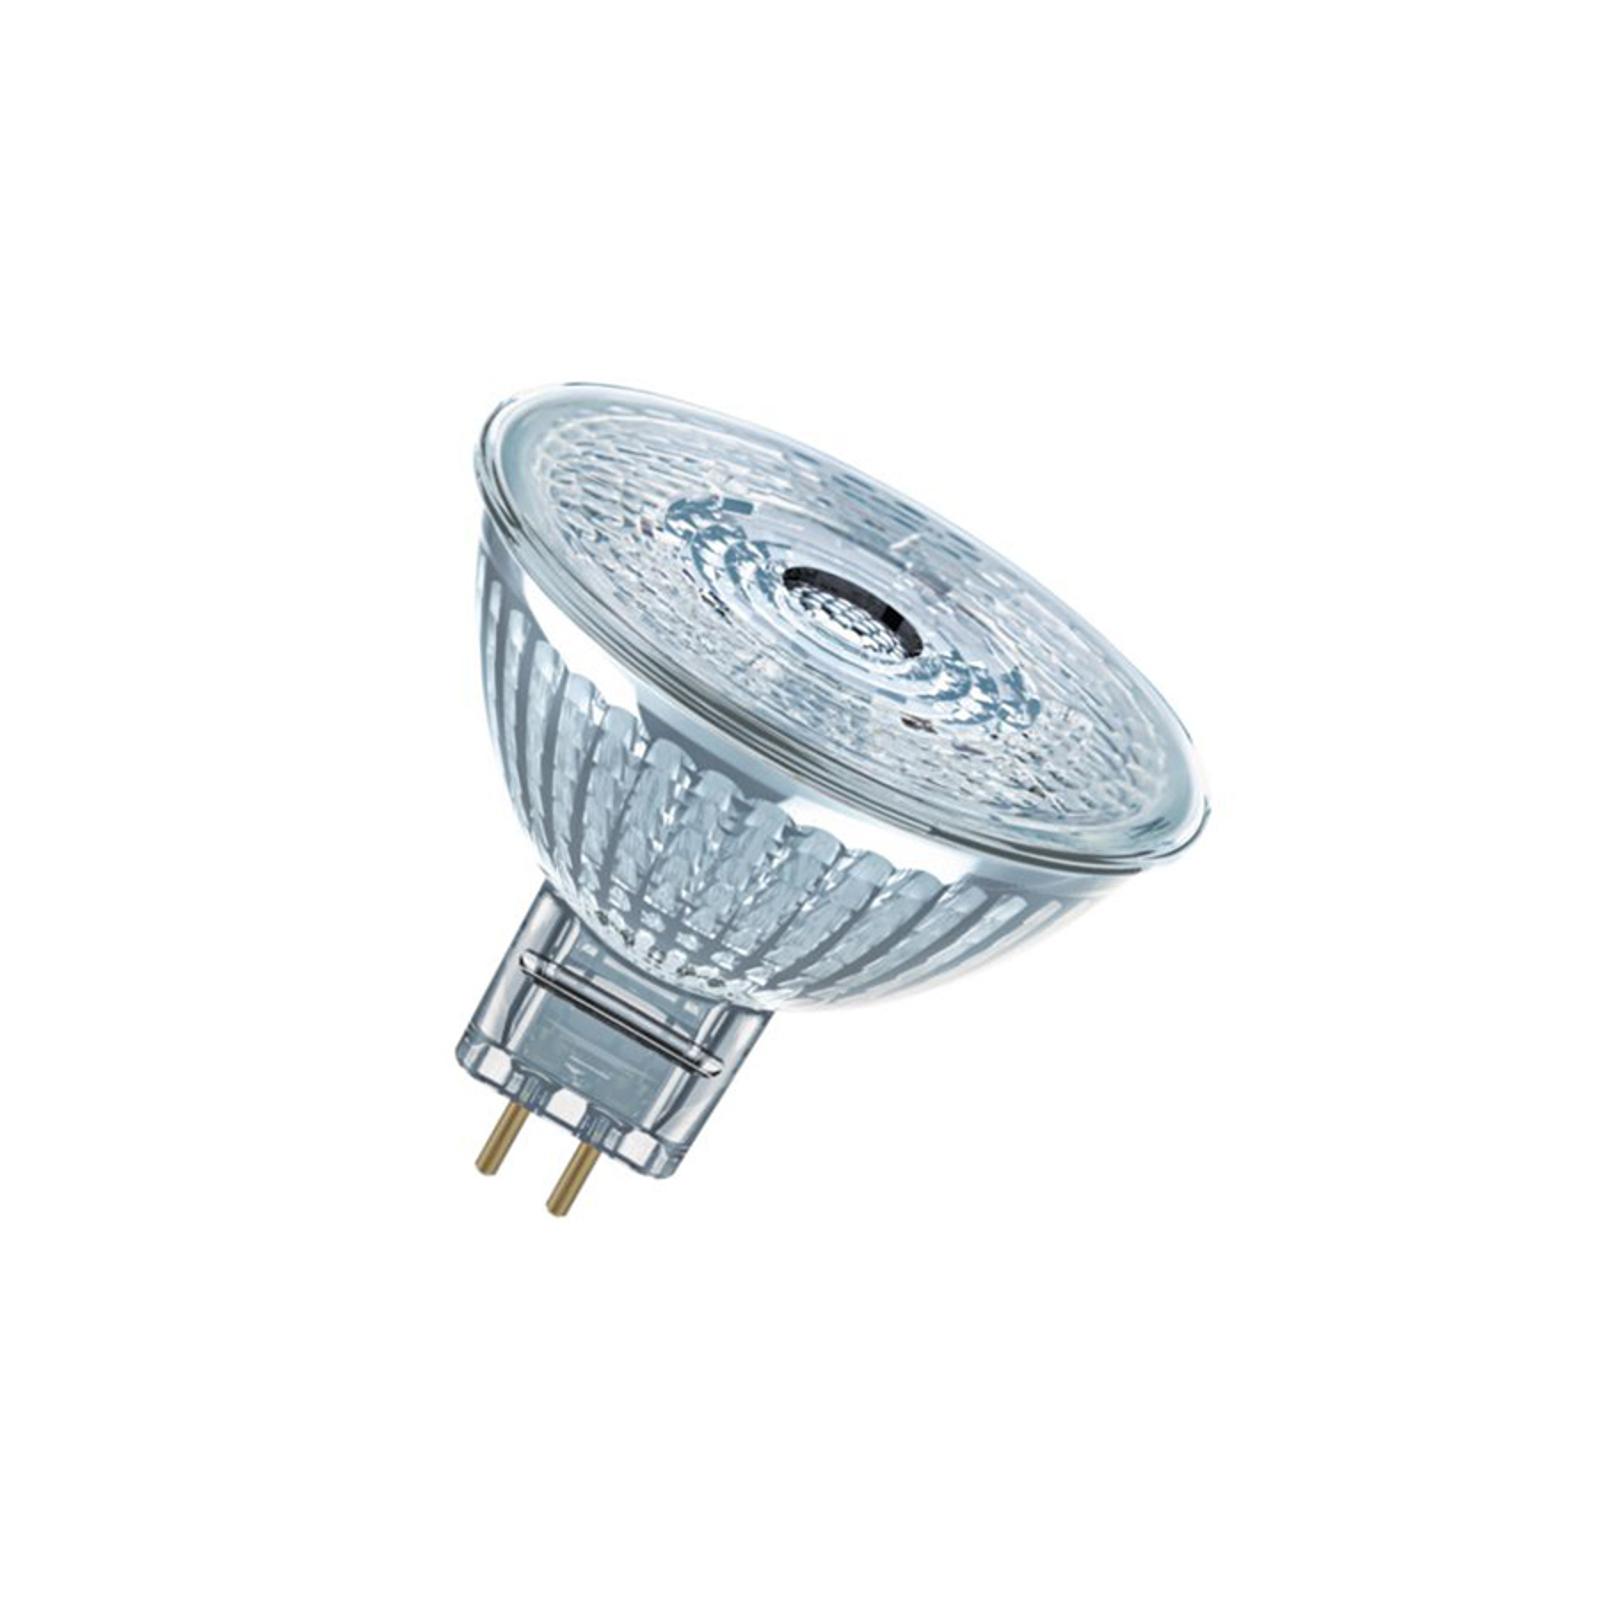 OSRAM LED-reflektor GU5,3 4,9W 927 36° dimbar